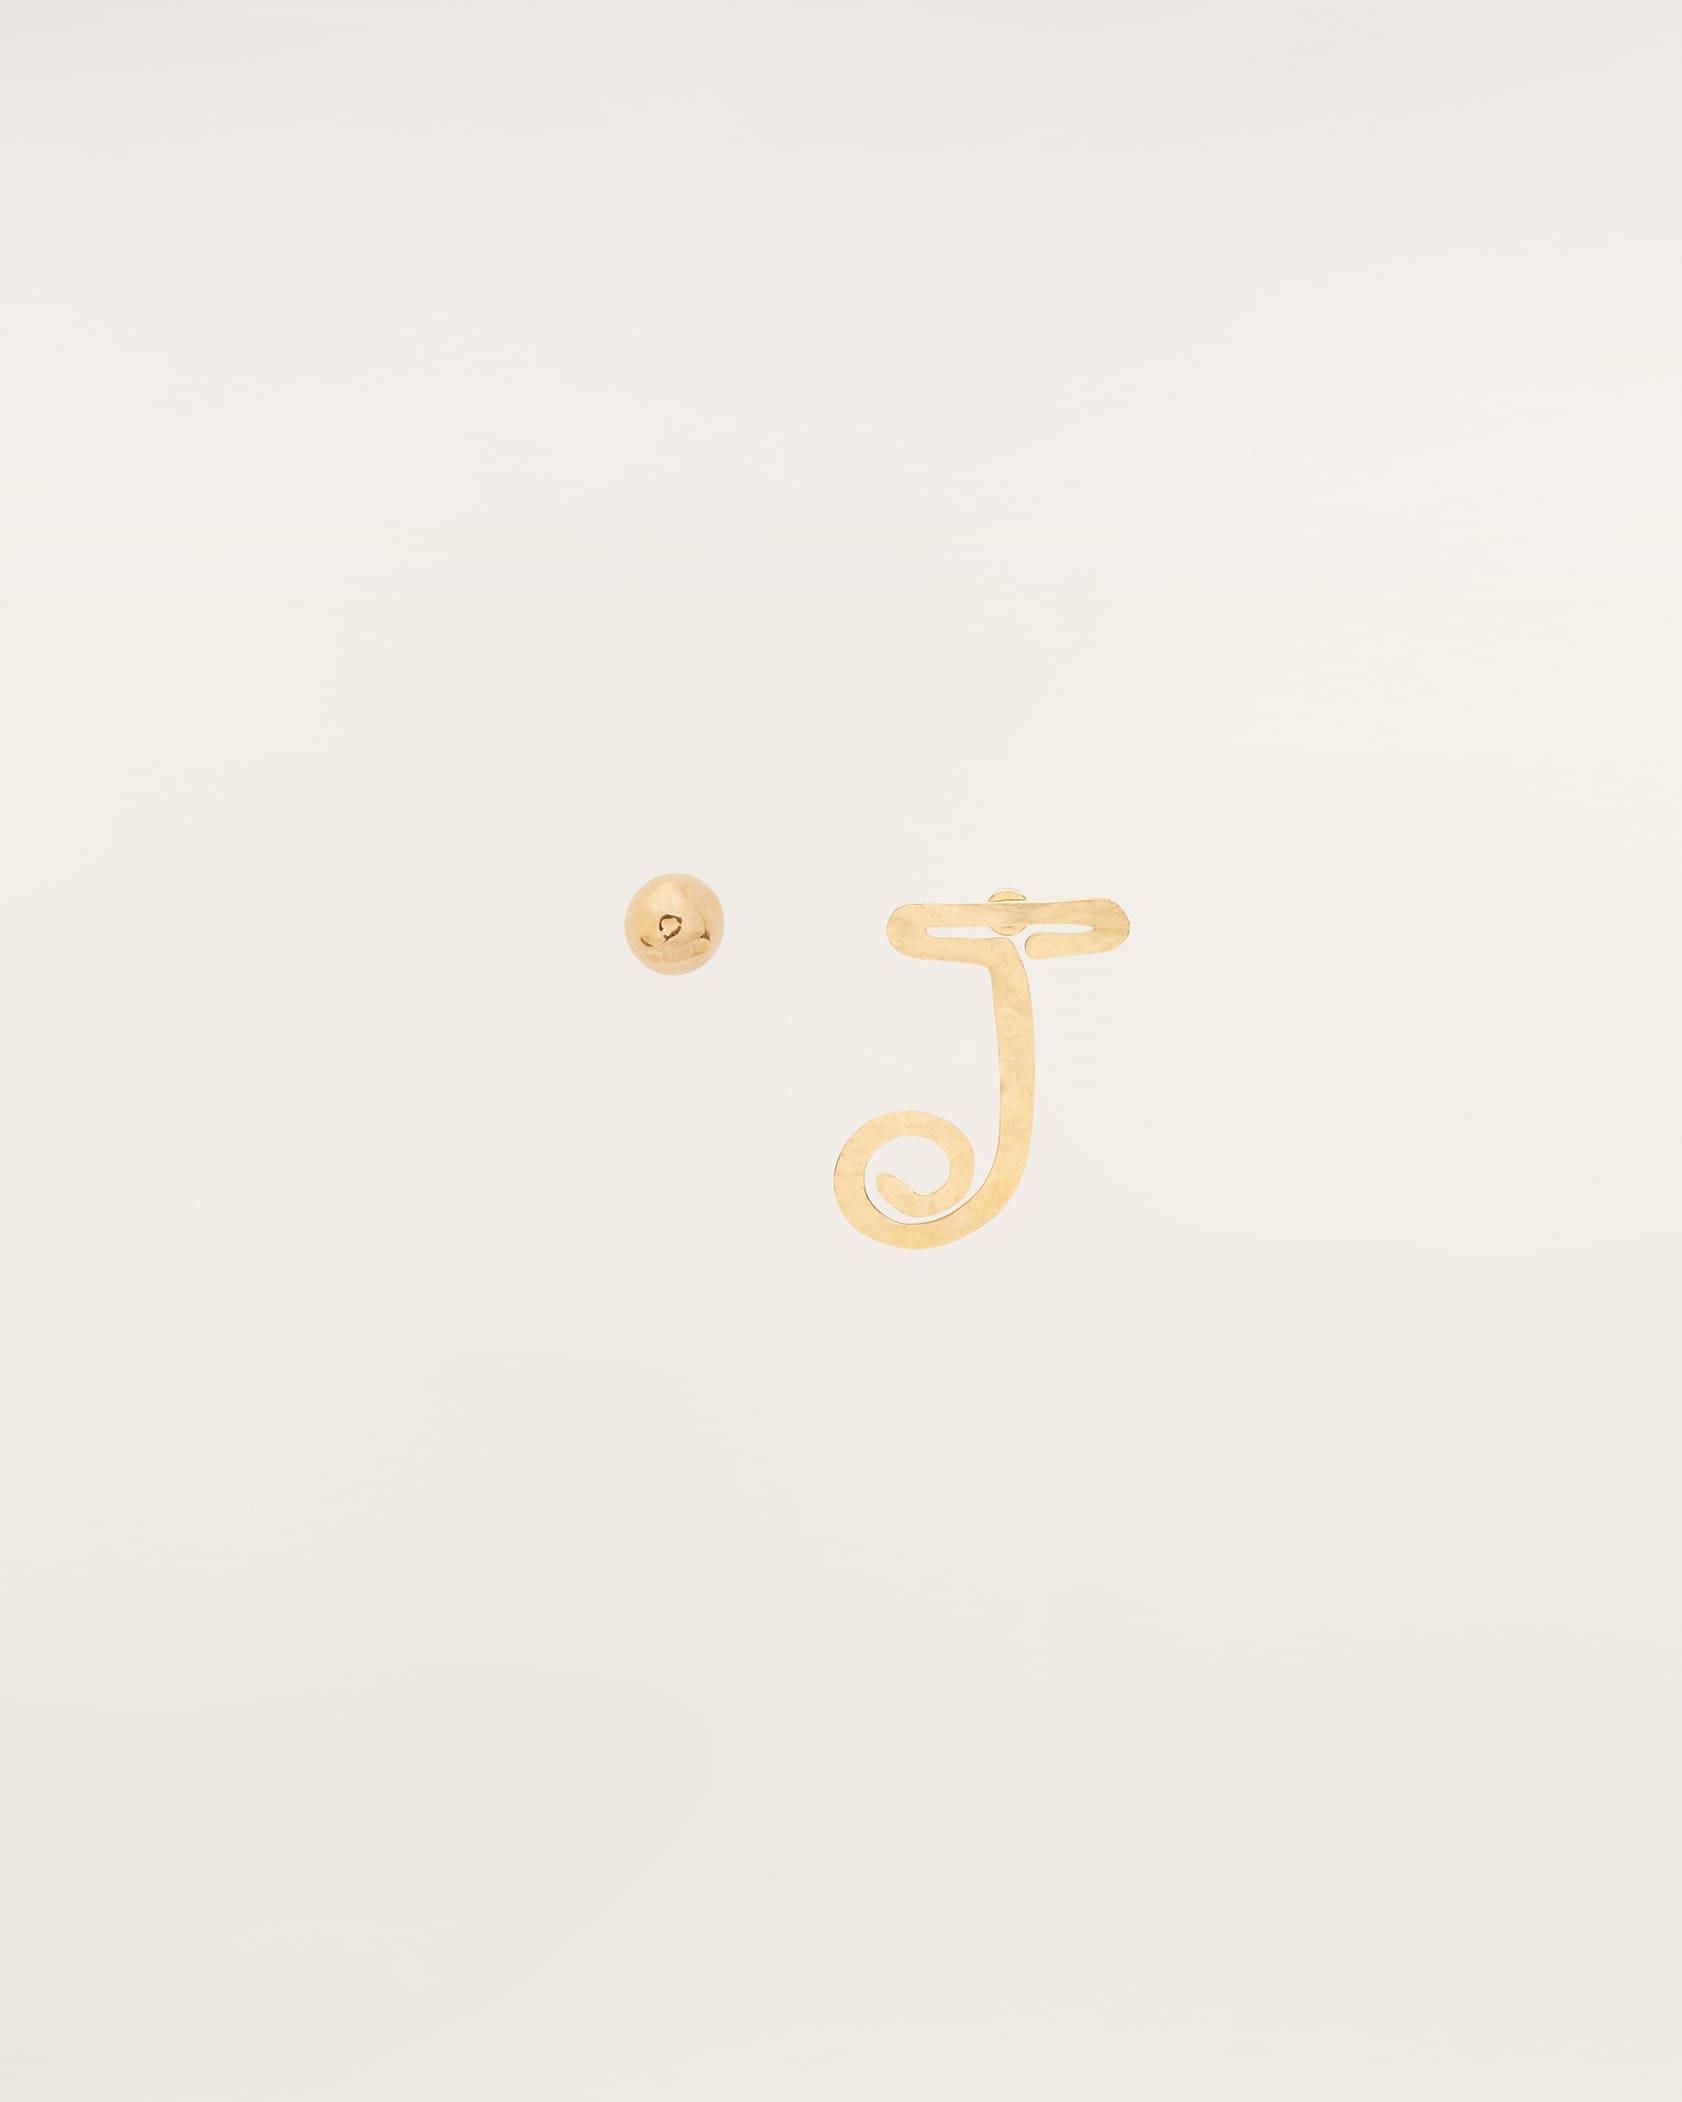 La boucle J